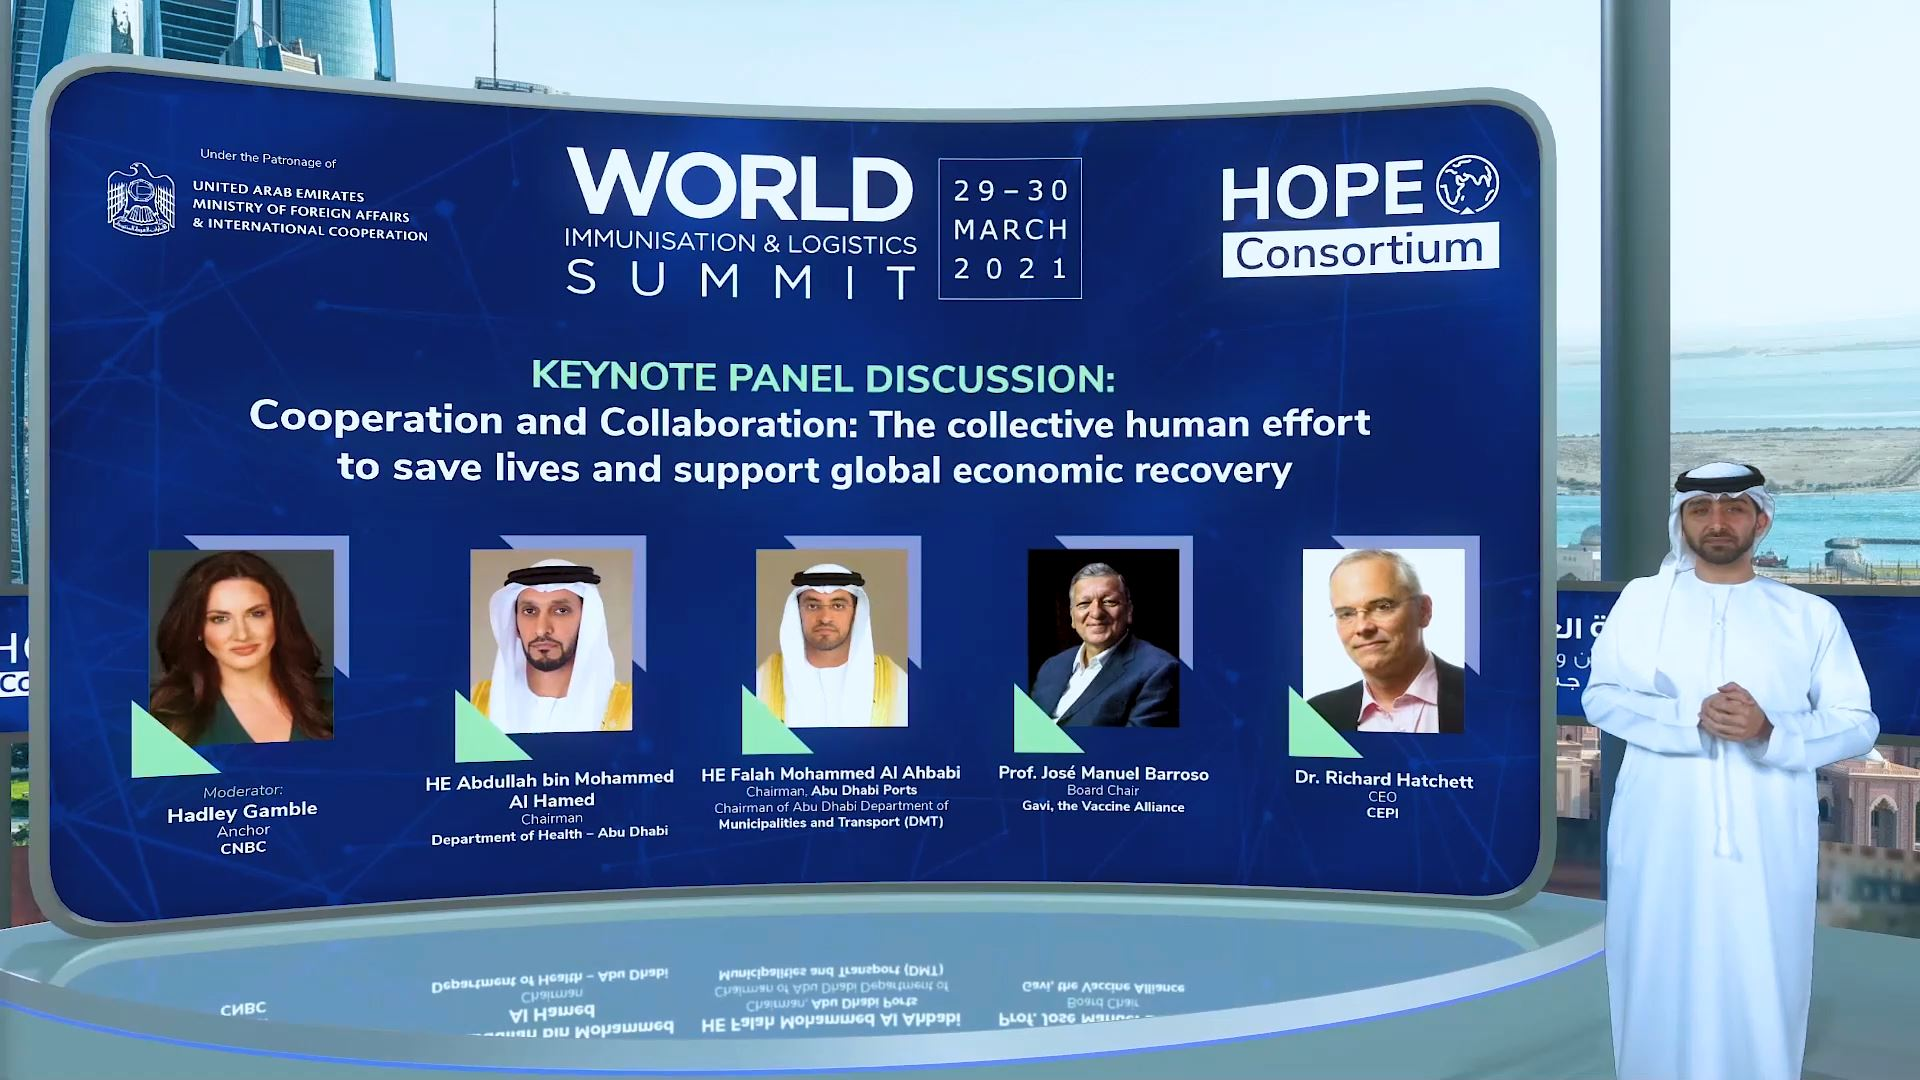 hope consortium world immunization and logistics summit virtual exhibition speaker presentation